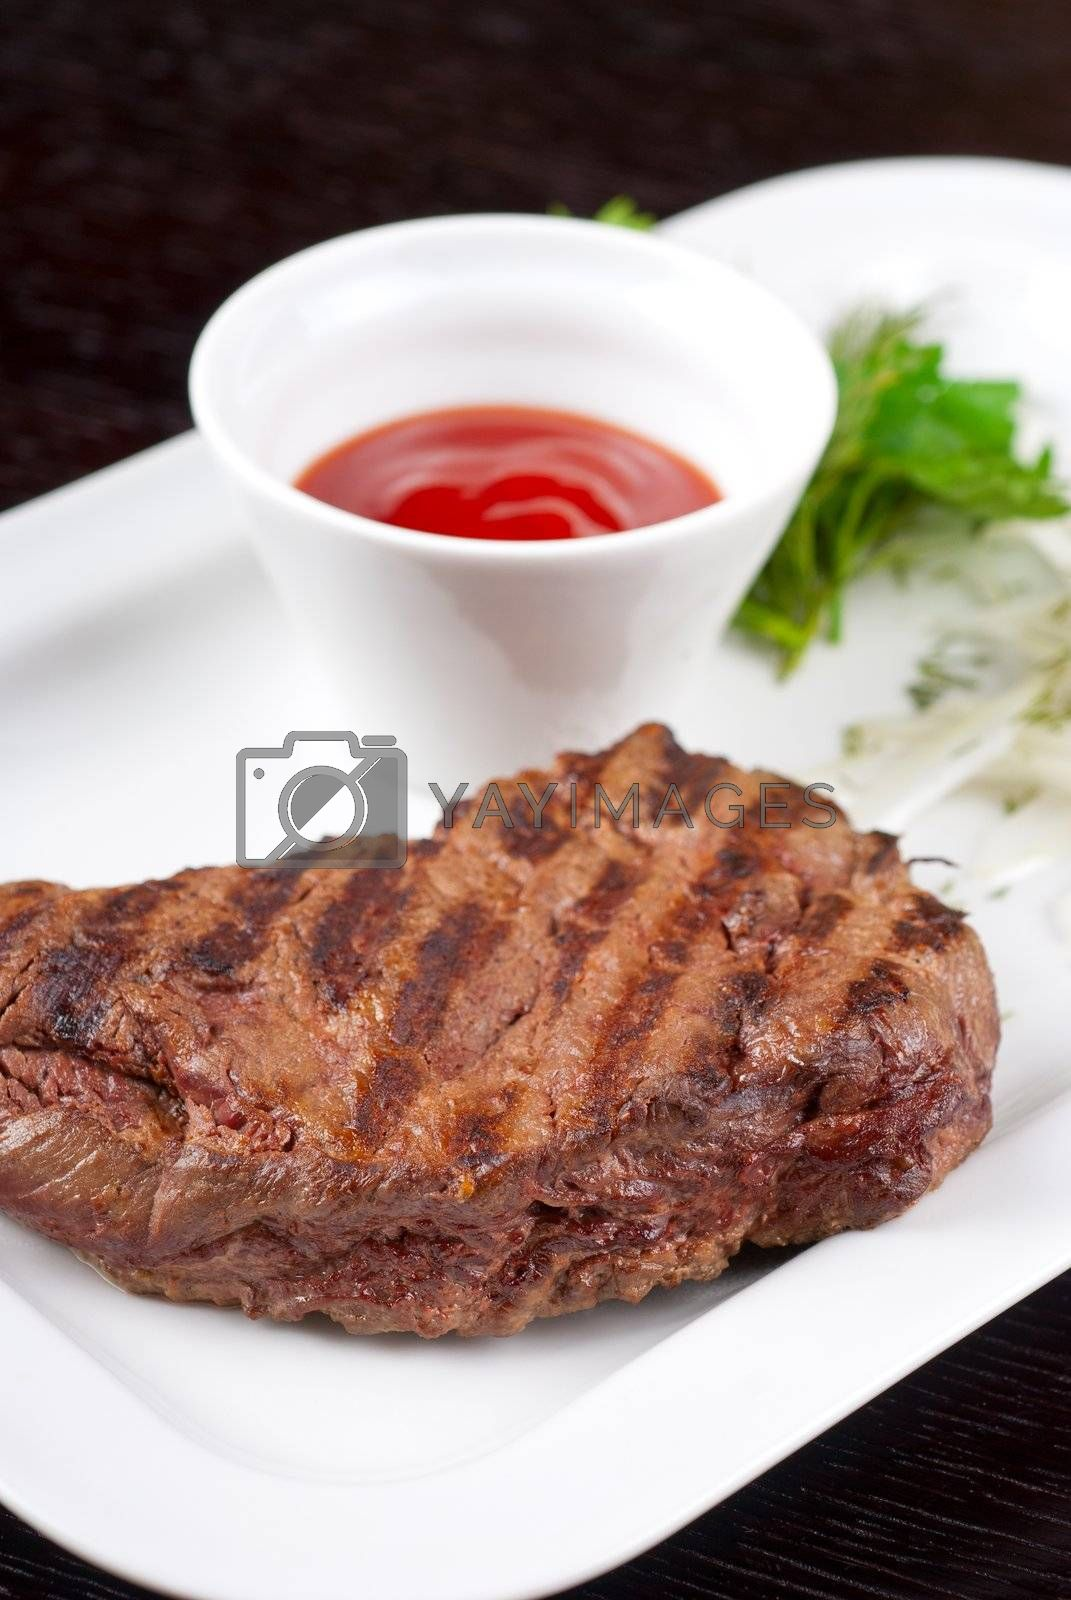 Juicy roasted beef steak with vegetables closeup at plate